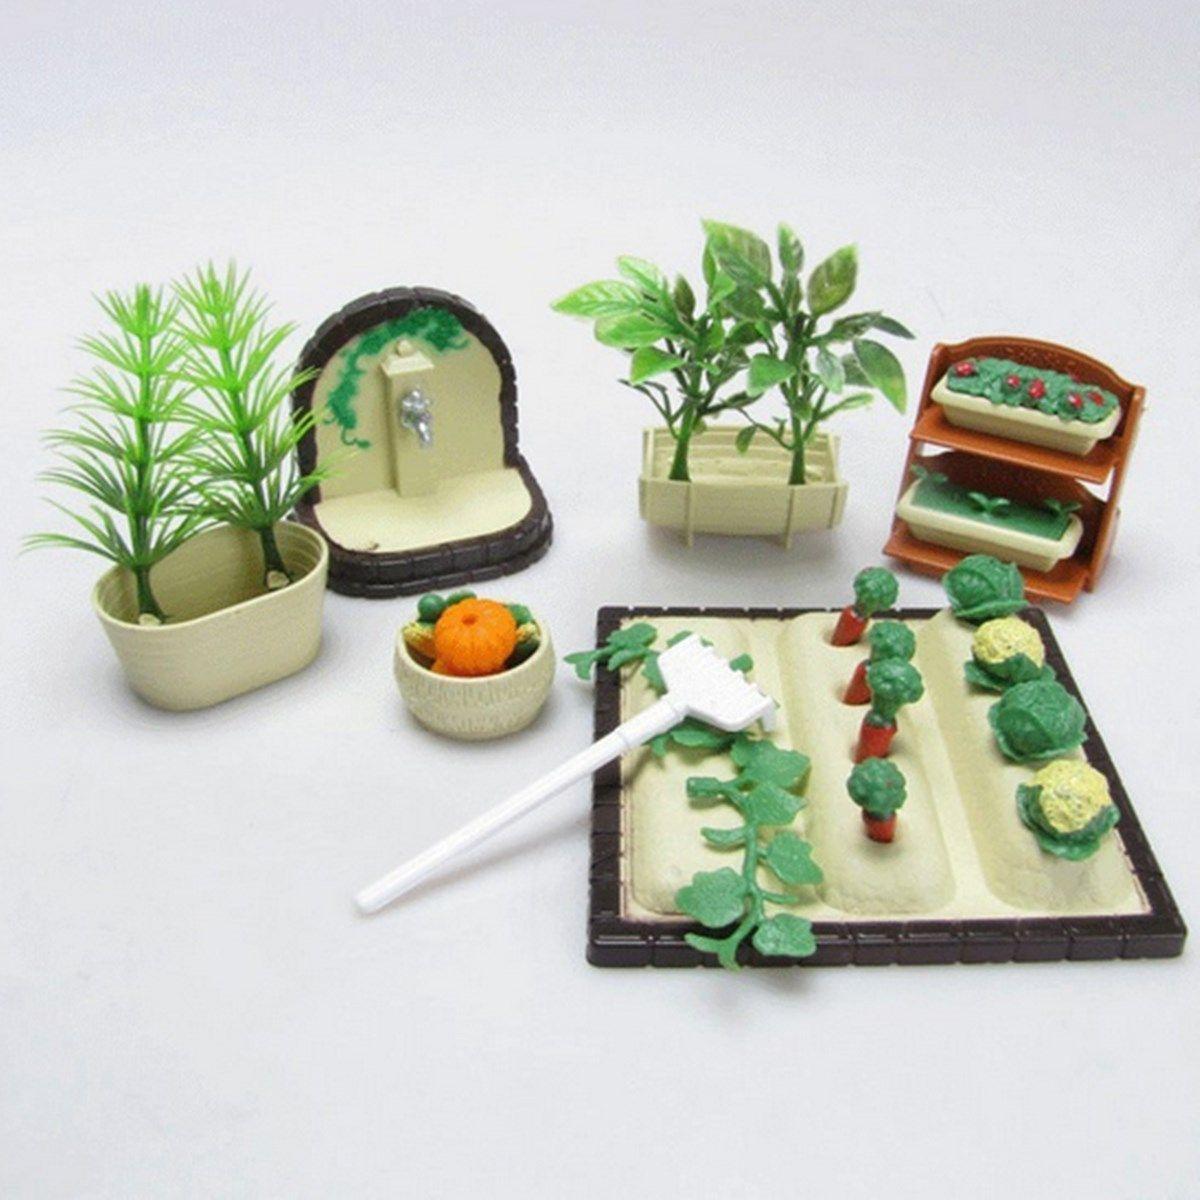 Diy Handmade Miniature Gardening Vegetables Sets For Dollhouse